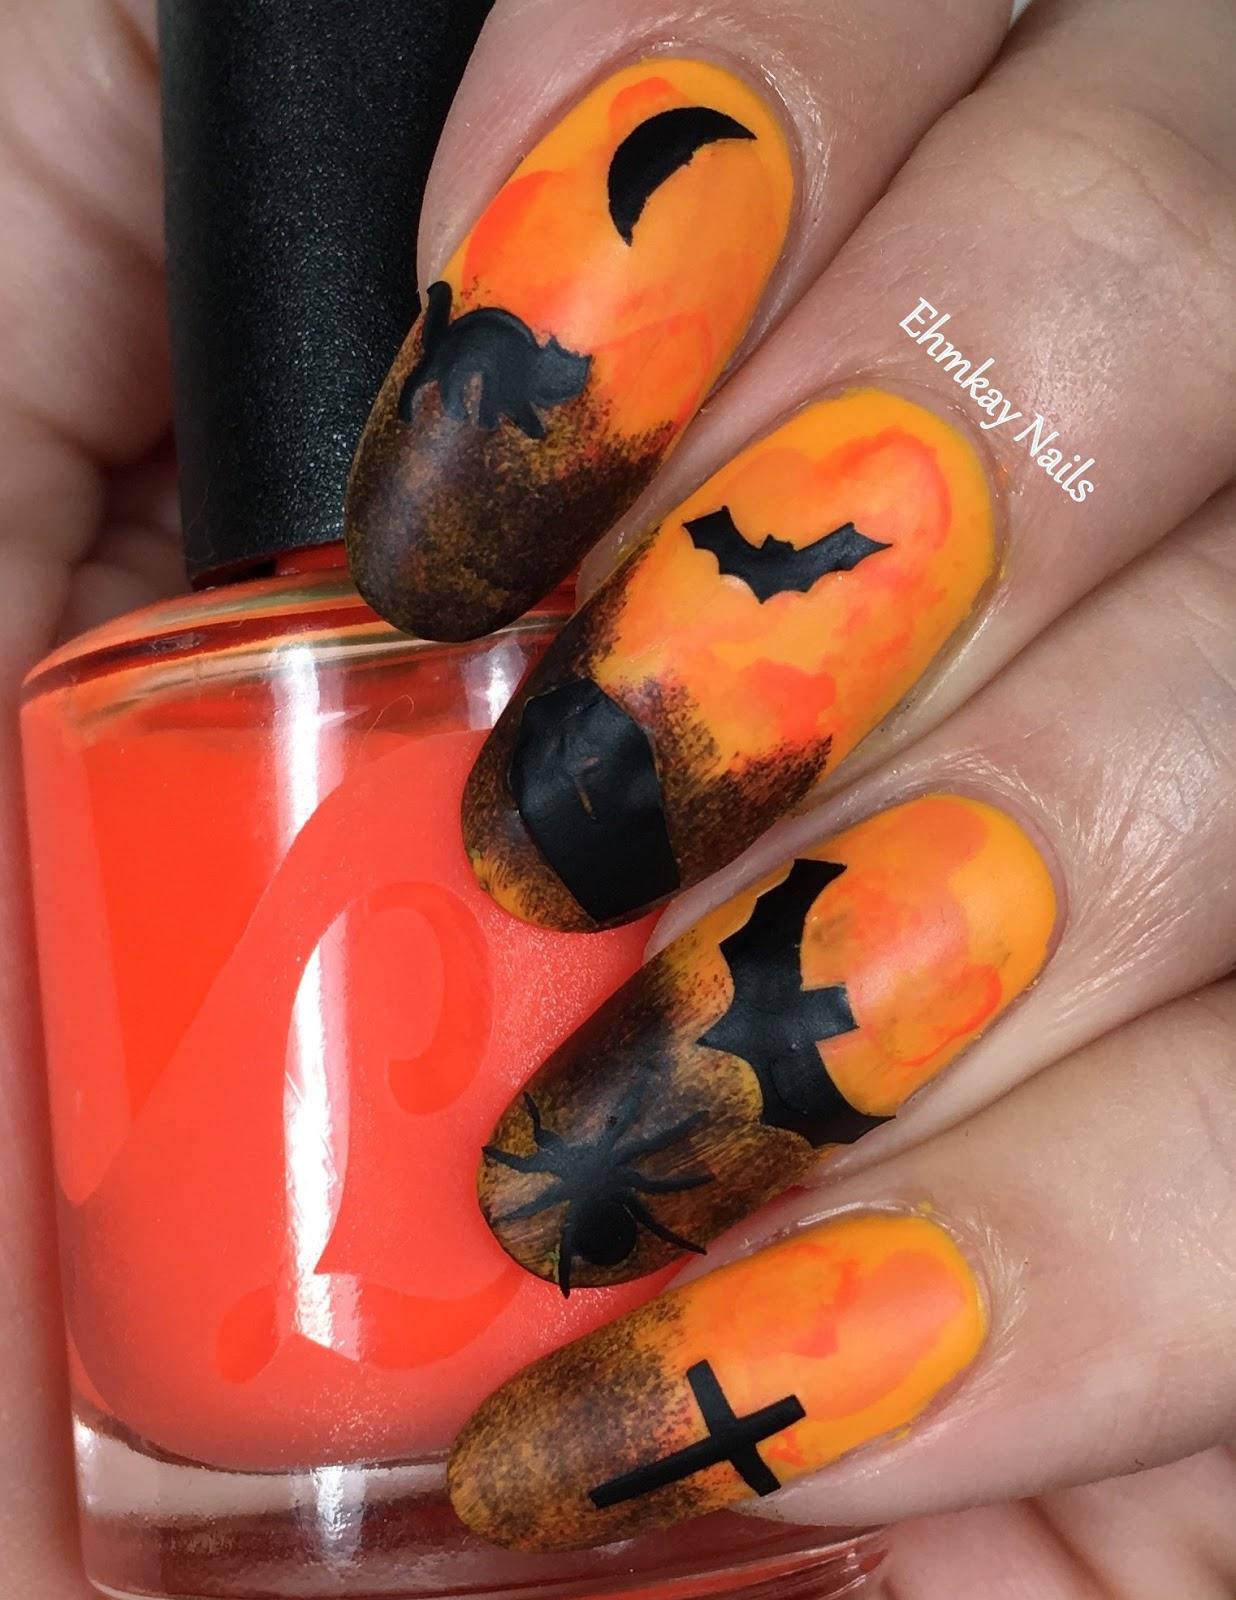 halloween nail art with halloween spooky stickers from lipsticks u0026 nail polish